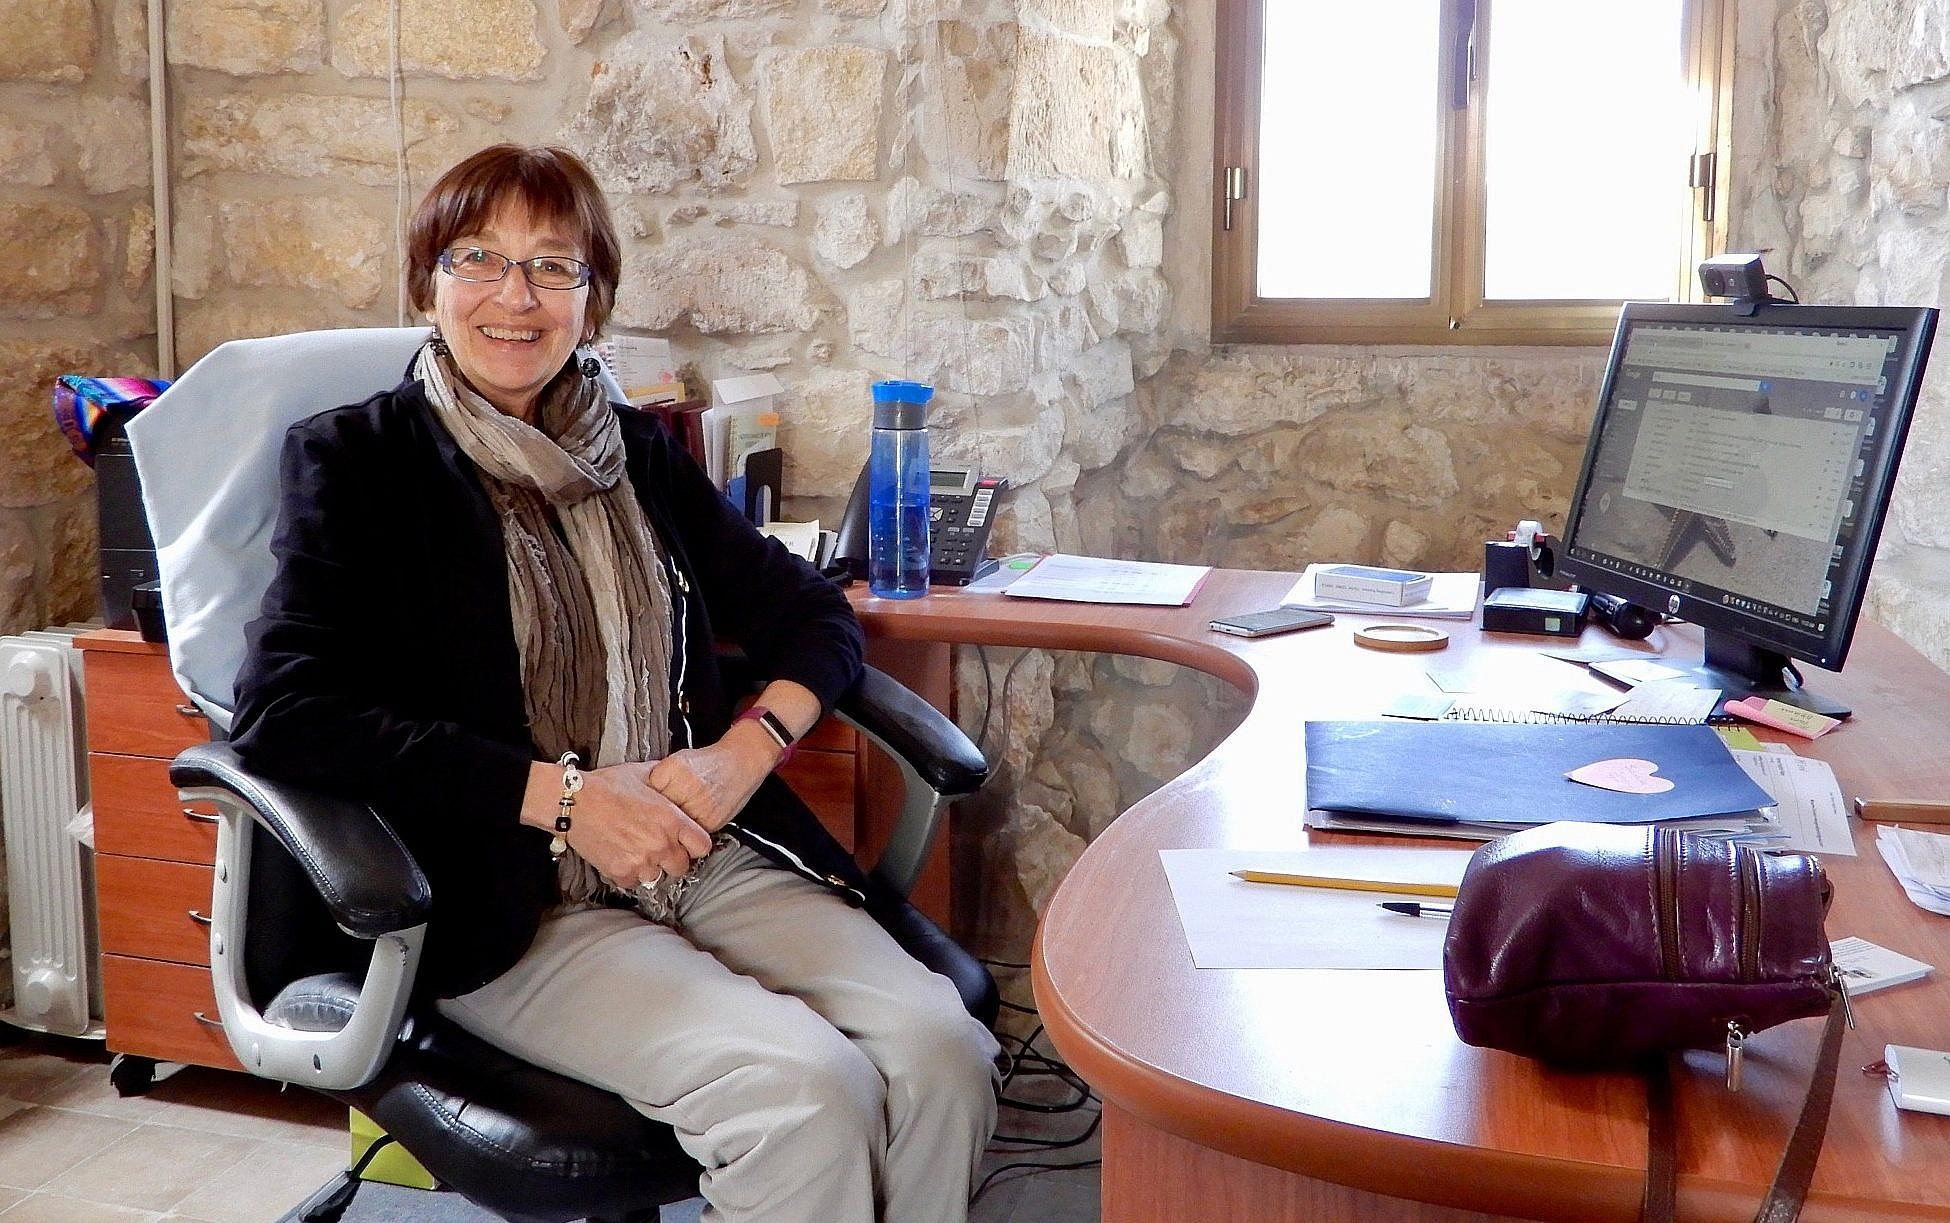 Israeli media writes about Sisters' work in Jerusalem.